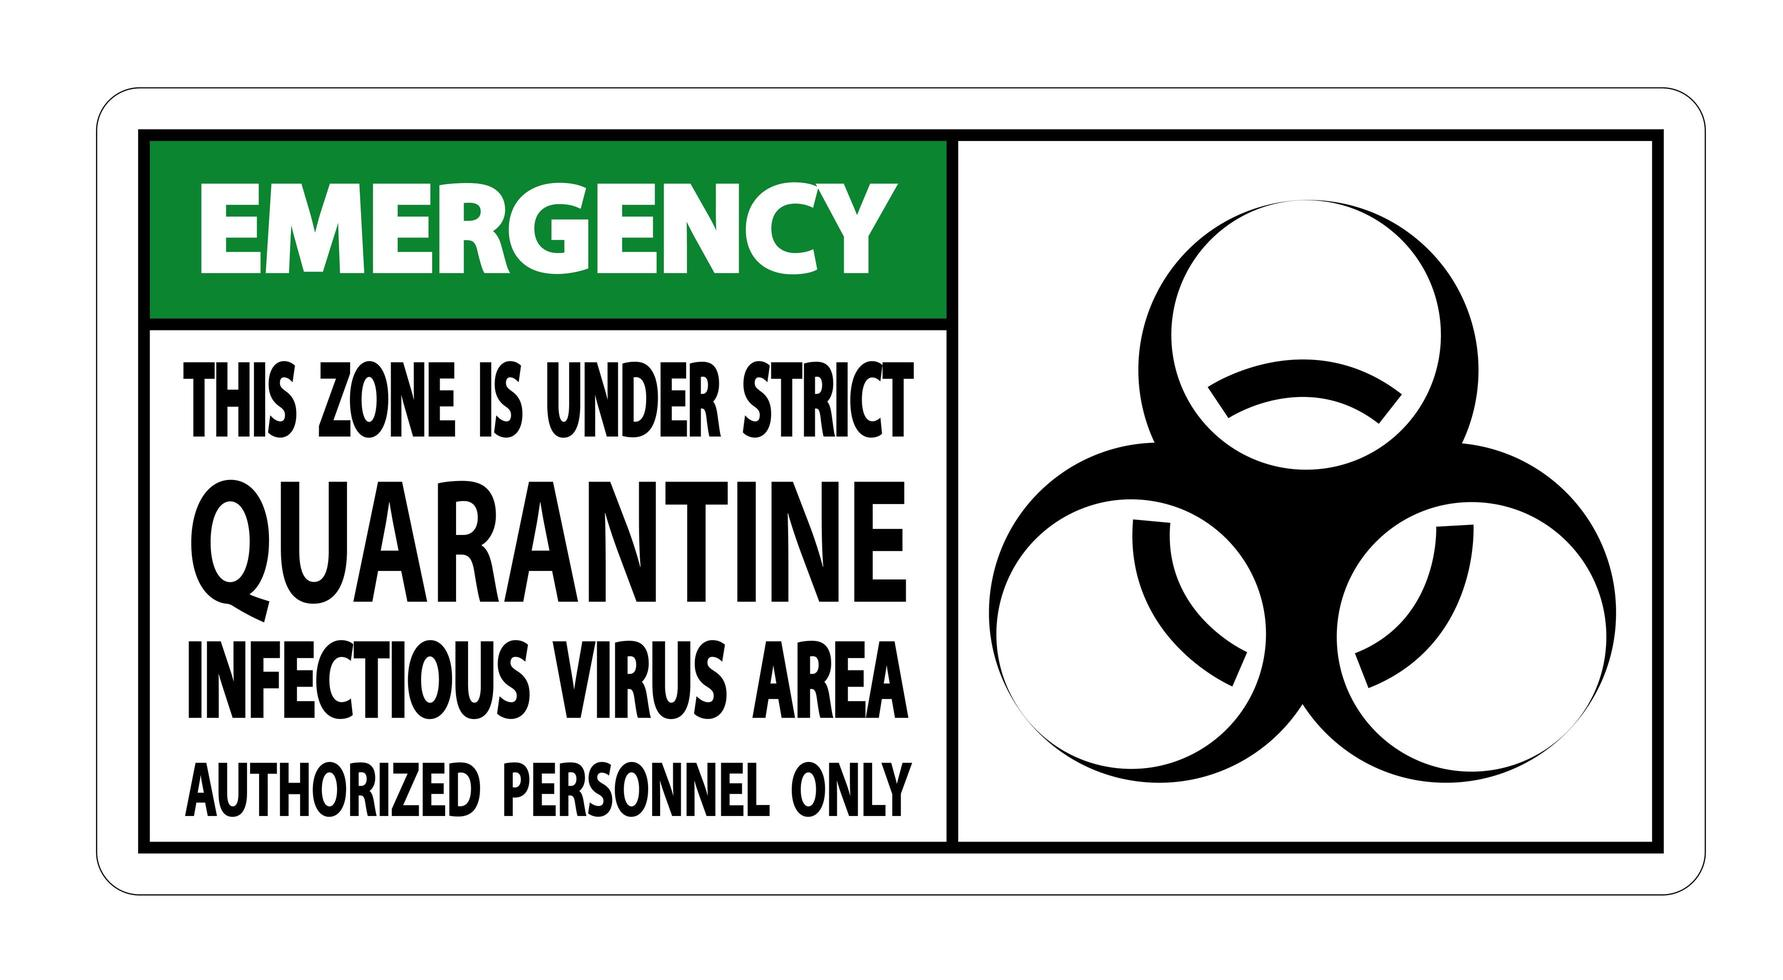 Notfall-Quarantäne-Infektionsvirus-Bereich vektor